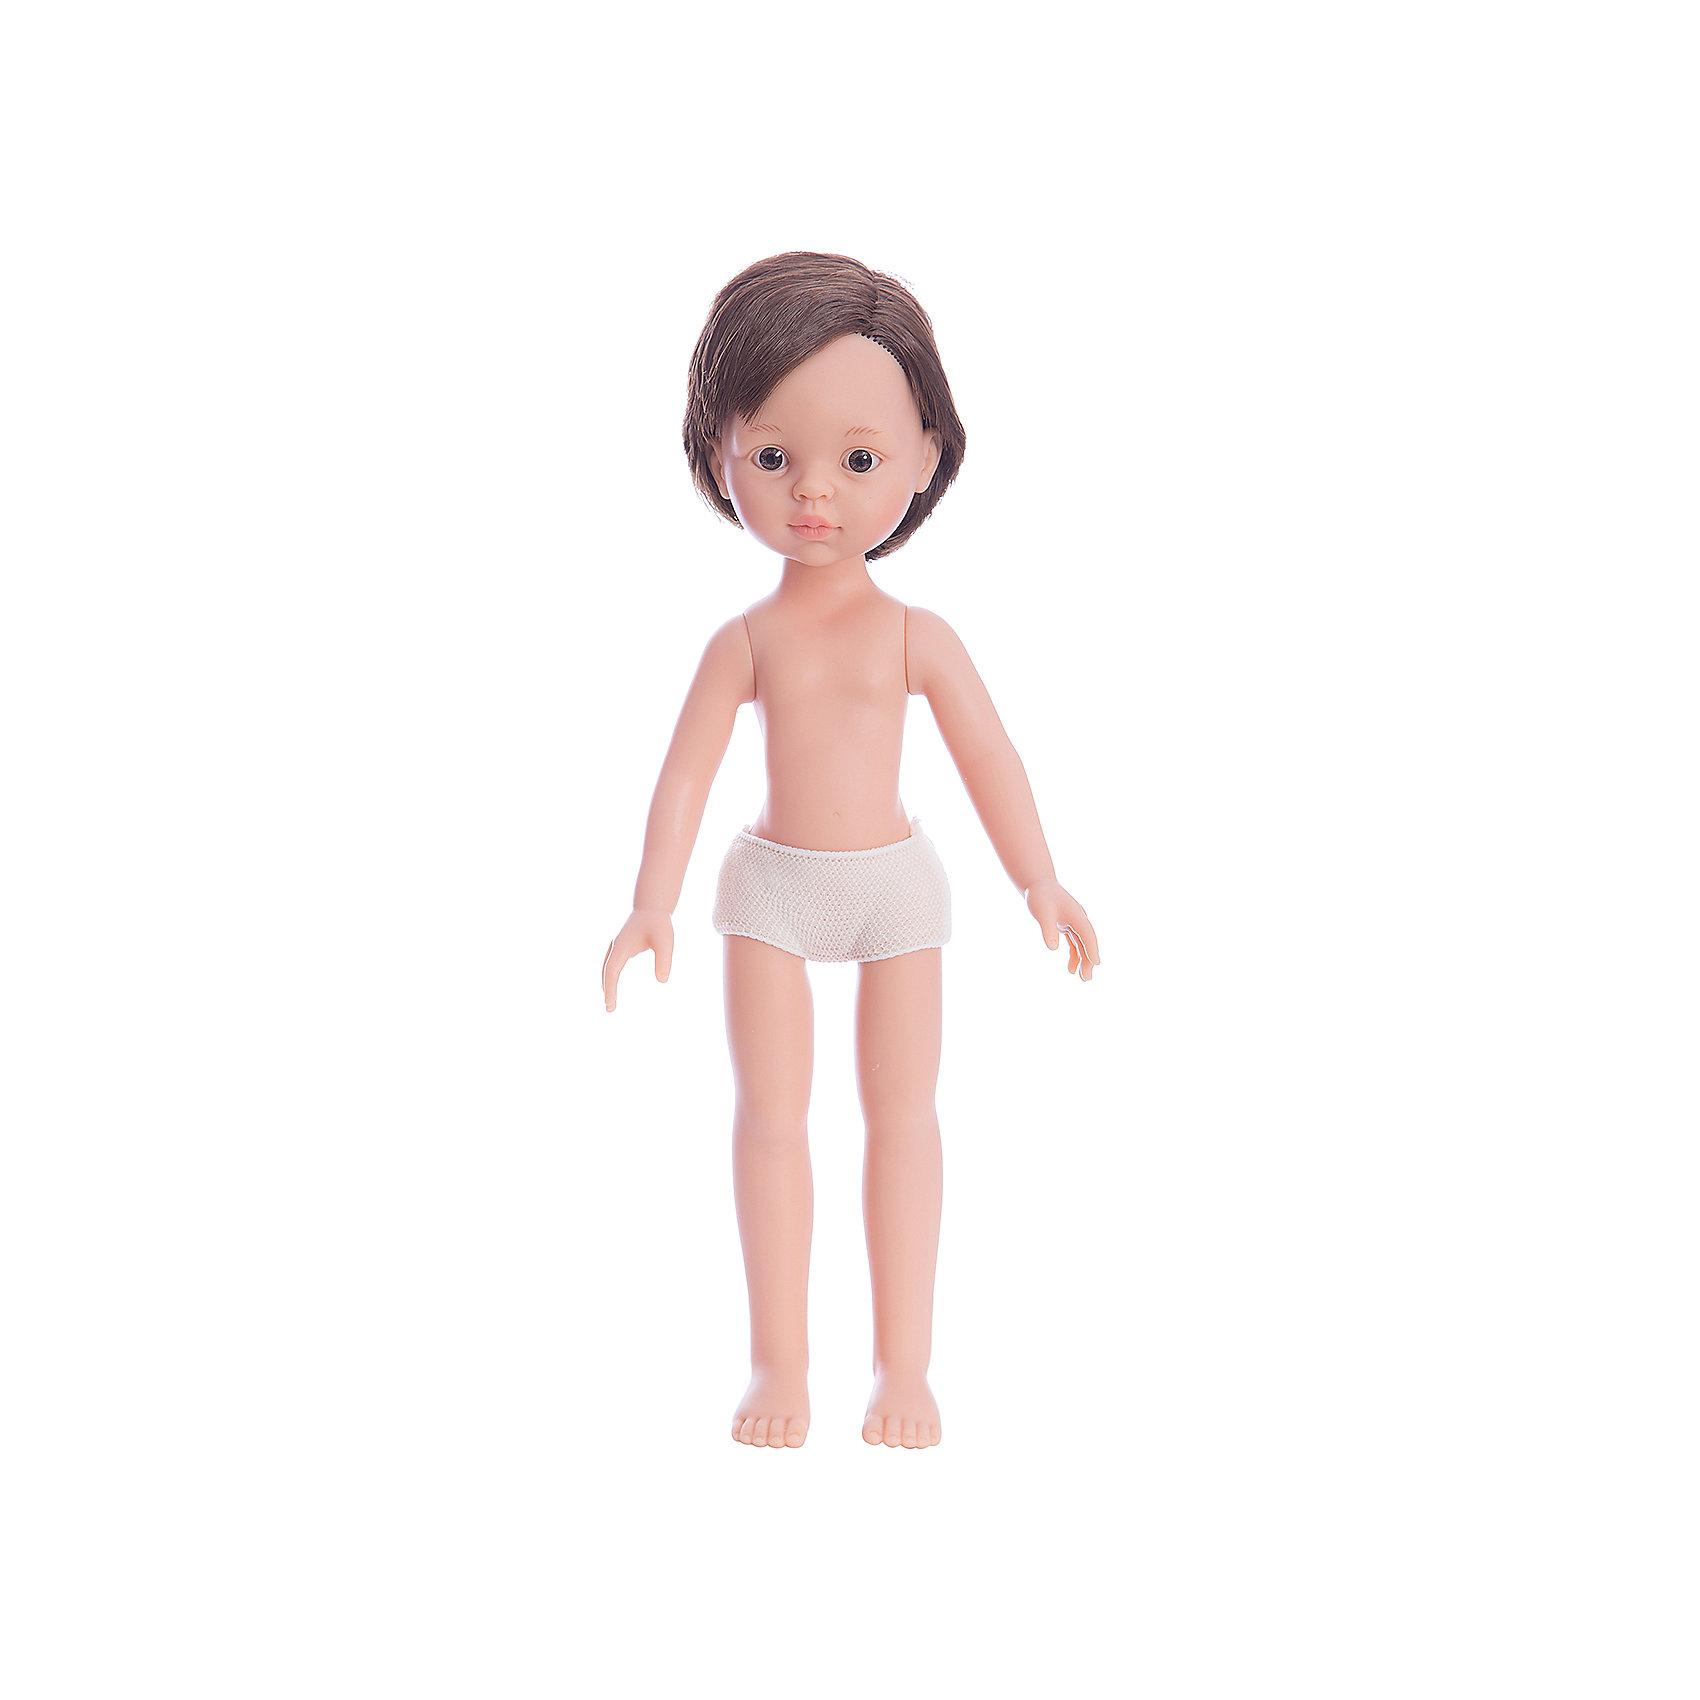 Кукла Paola Reina Висент без одежды, 32 смБренды кукол<br><br><br>Ширина мм: 70<br>Глубина мм: 140<br>Высота мм: 320<br>Вес г: 330<br>Возраст от месяцев: 36<br>Возраст до месяцев: 144<br>Пол: Женский<br>Возраст: Детский<br>SKU: 7118840